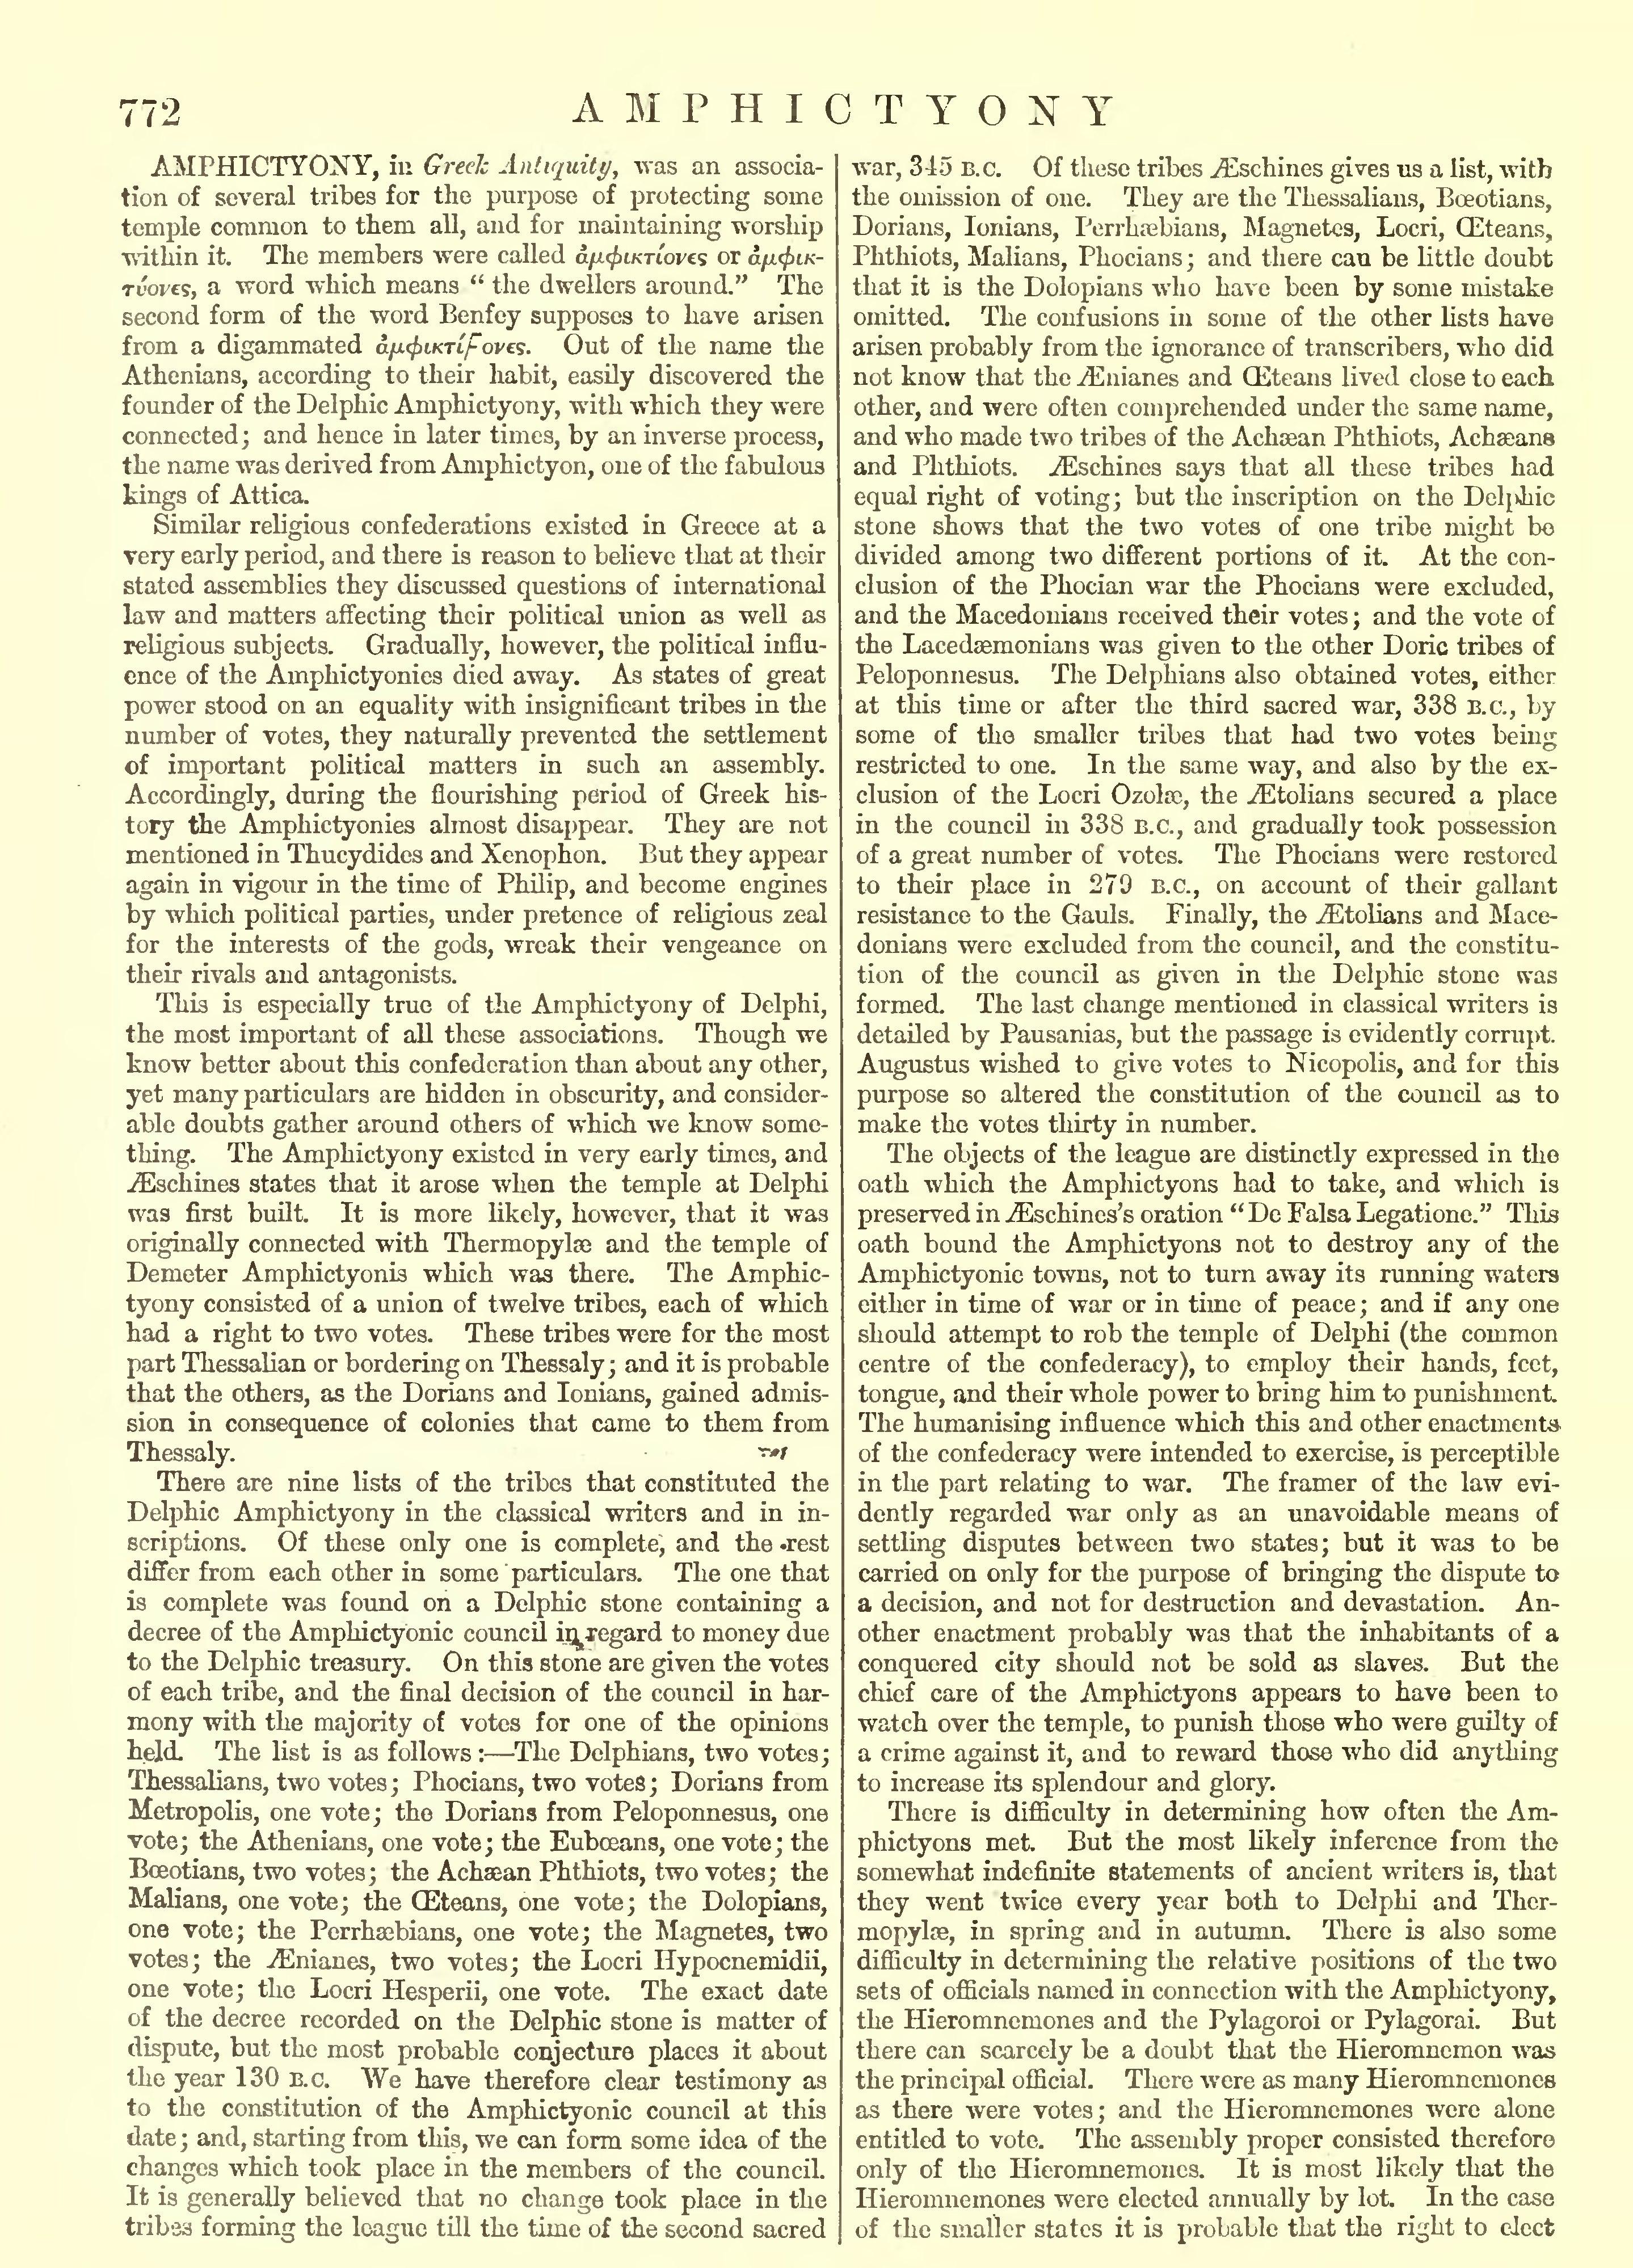 encyclopedia britannica pdf free download